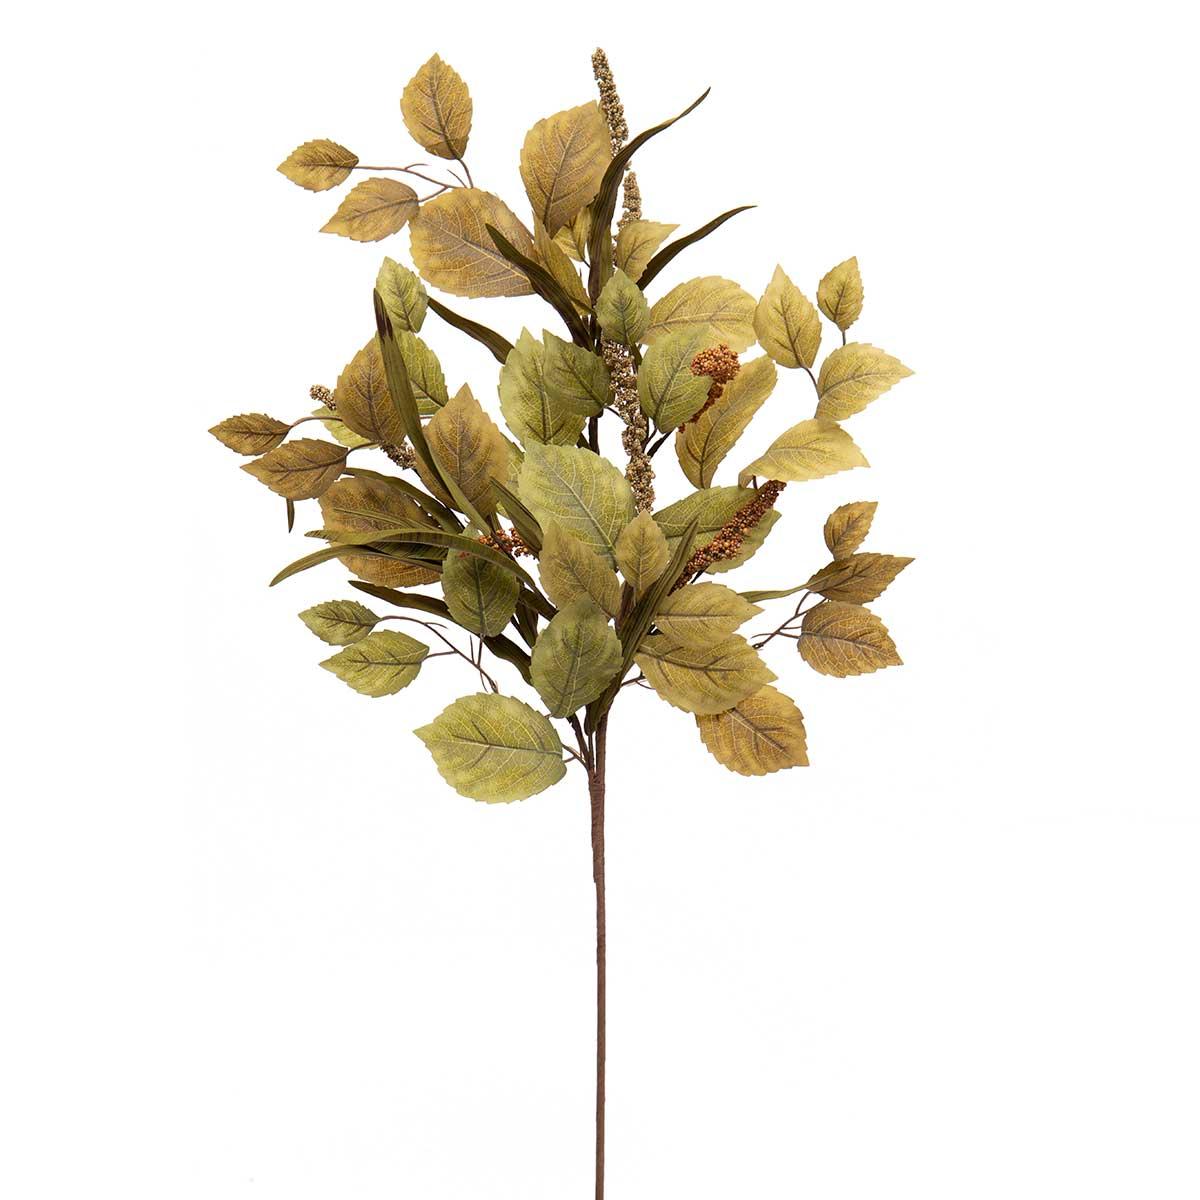 GREEN/BROWN LINDEN LEAF SPRAY